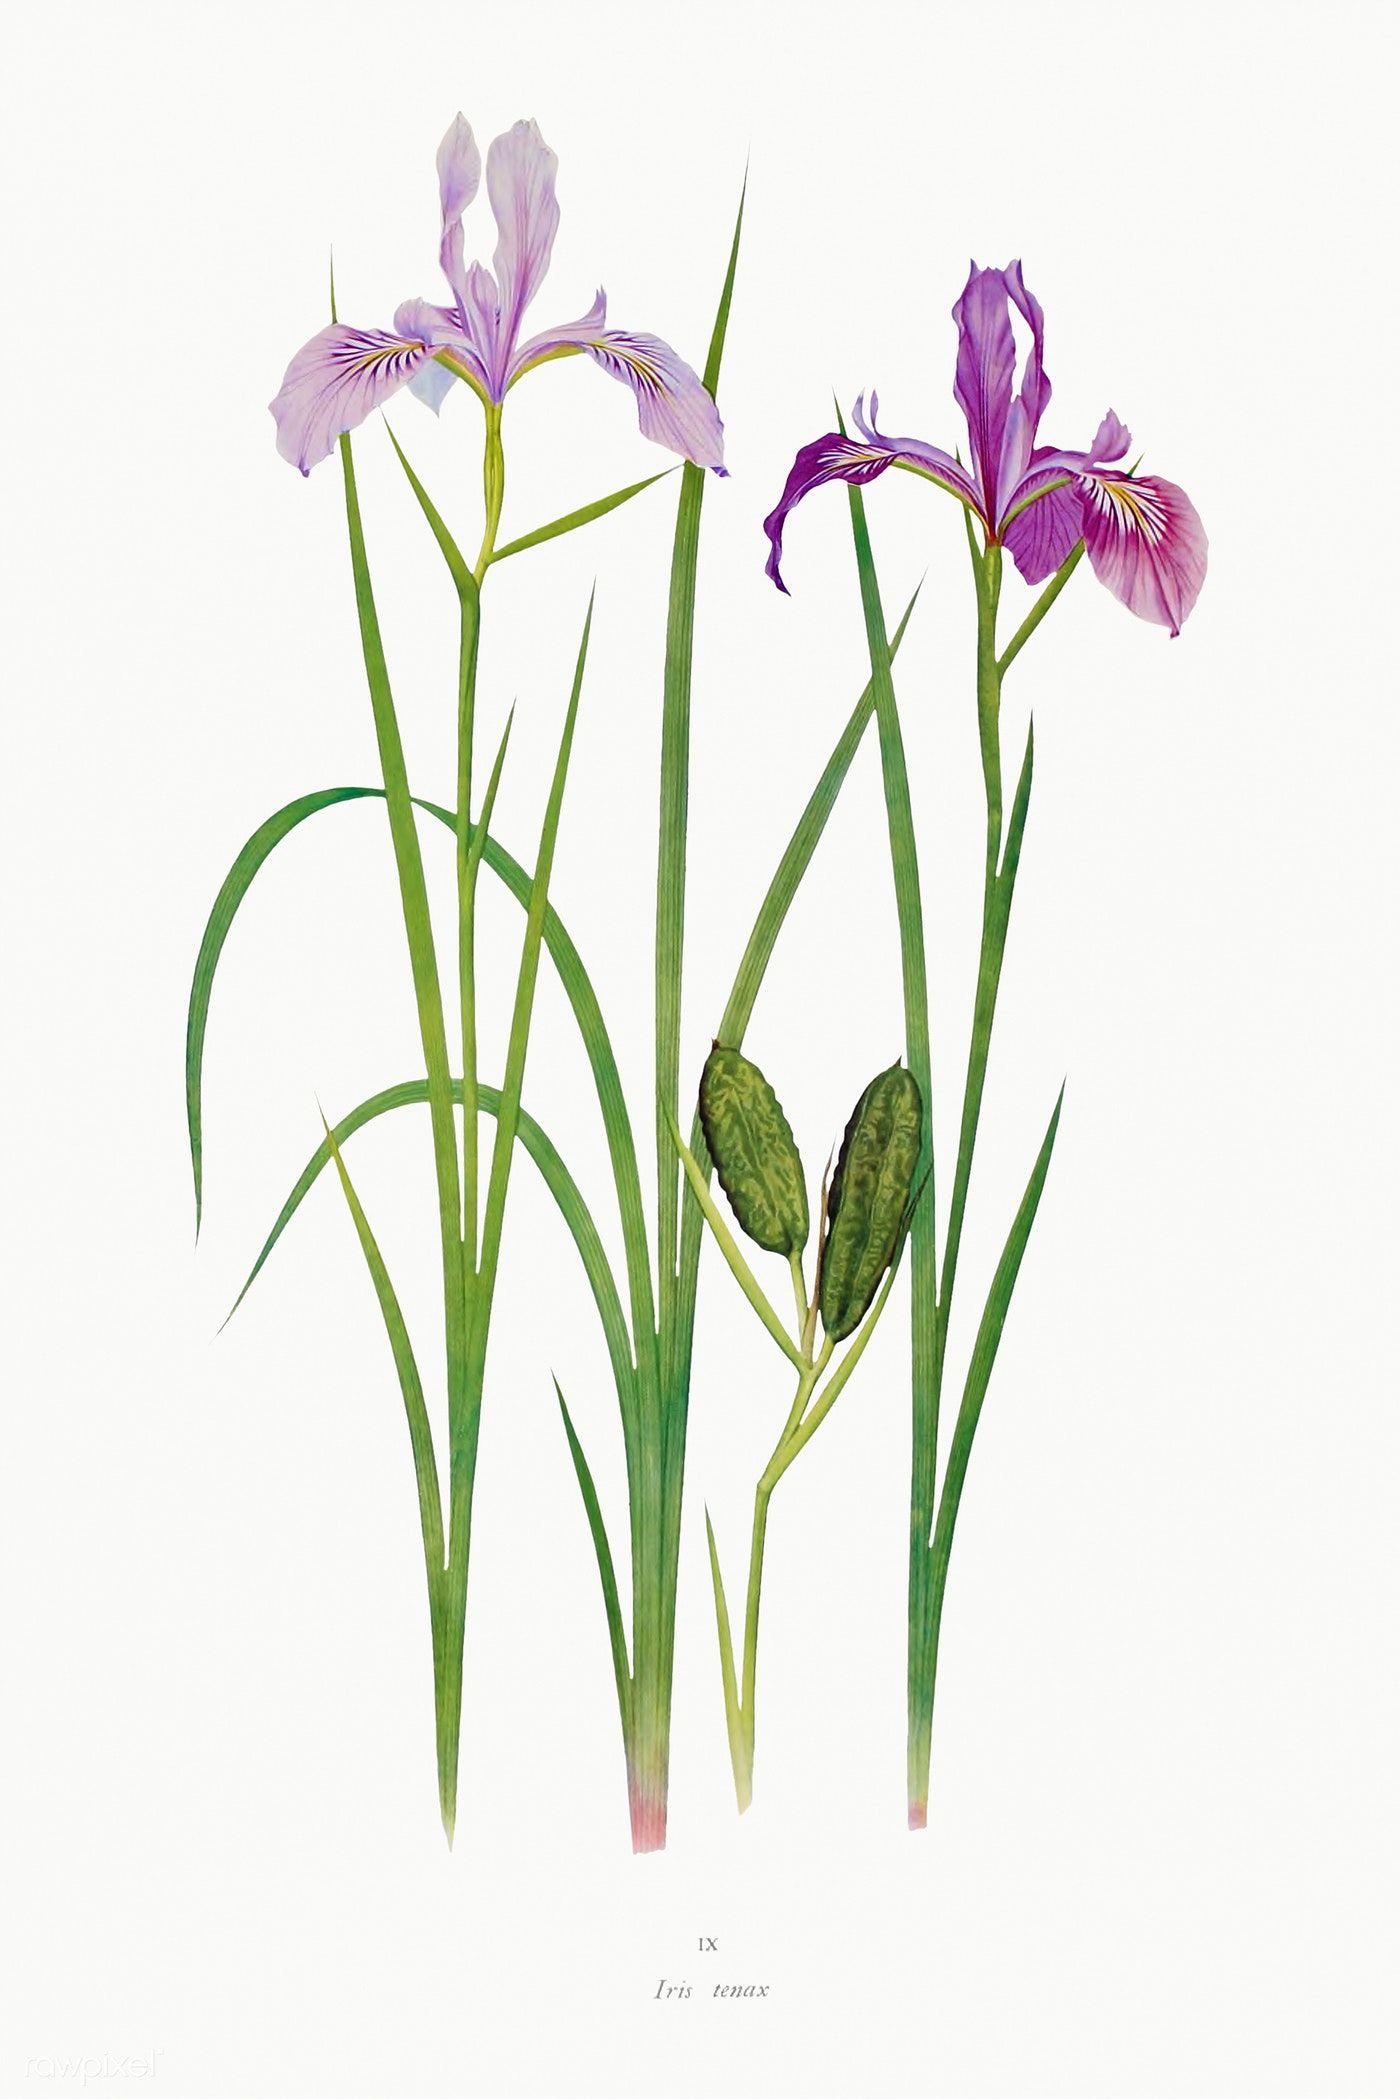 Download Premium Illustration Of Vintage Iris Flower Illustration Template In 2020 Flower Illustration Iris Flowers Flower Drawing